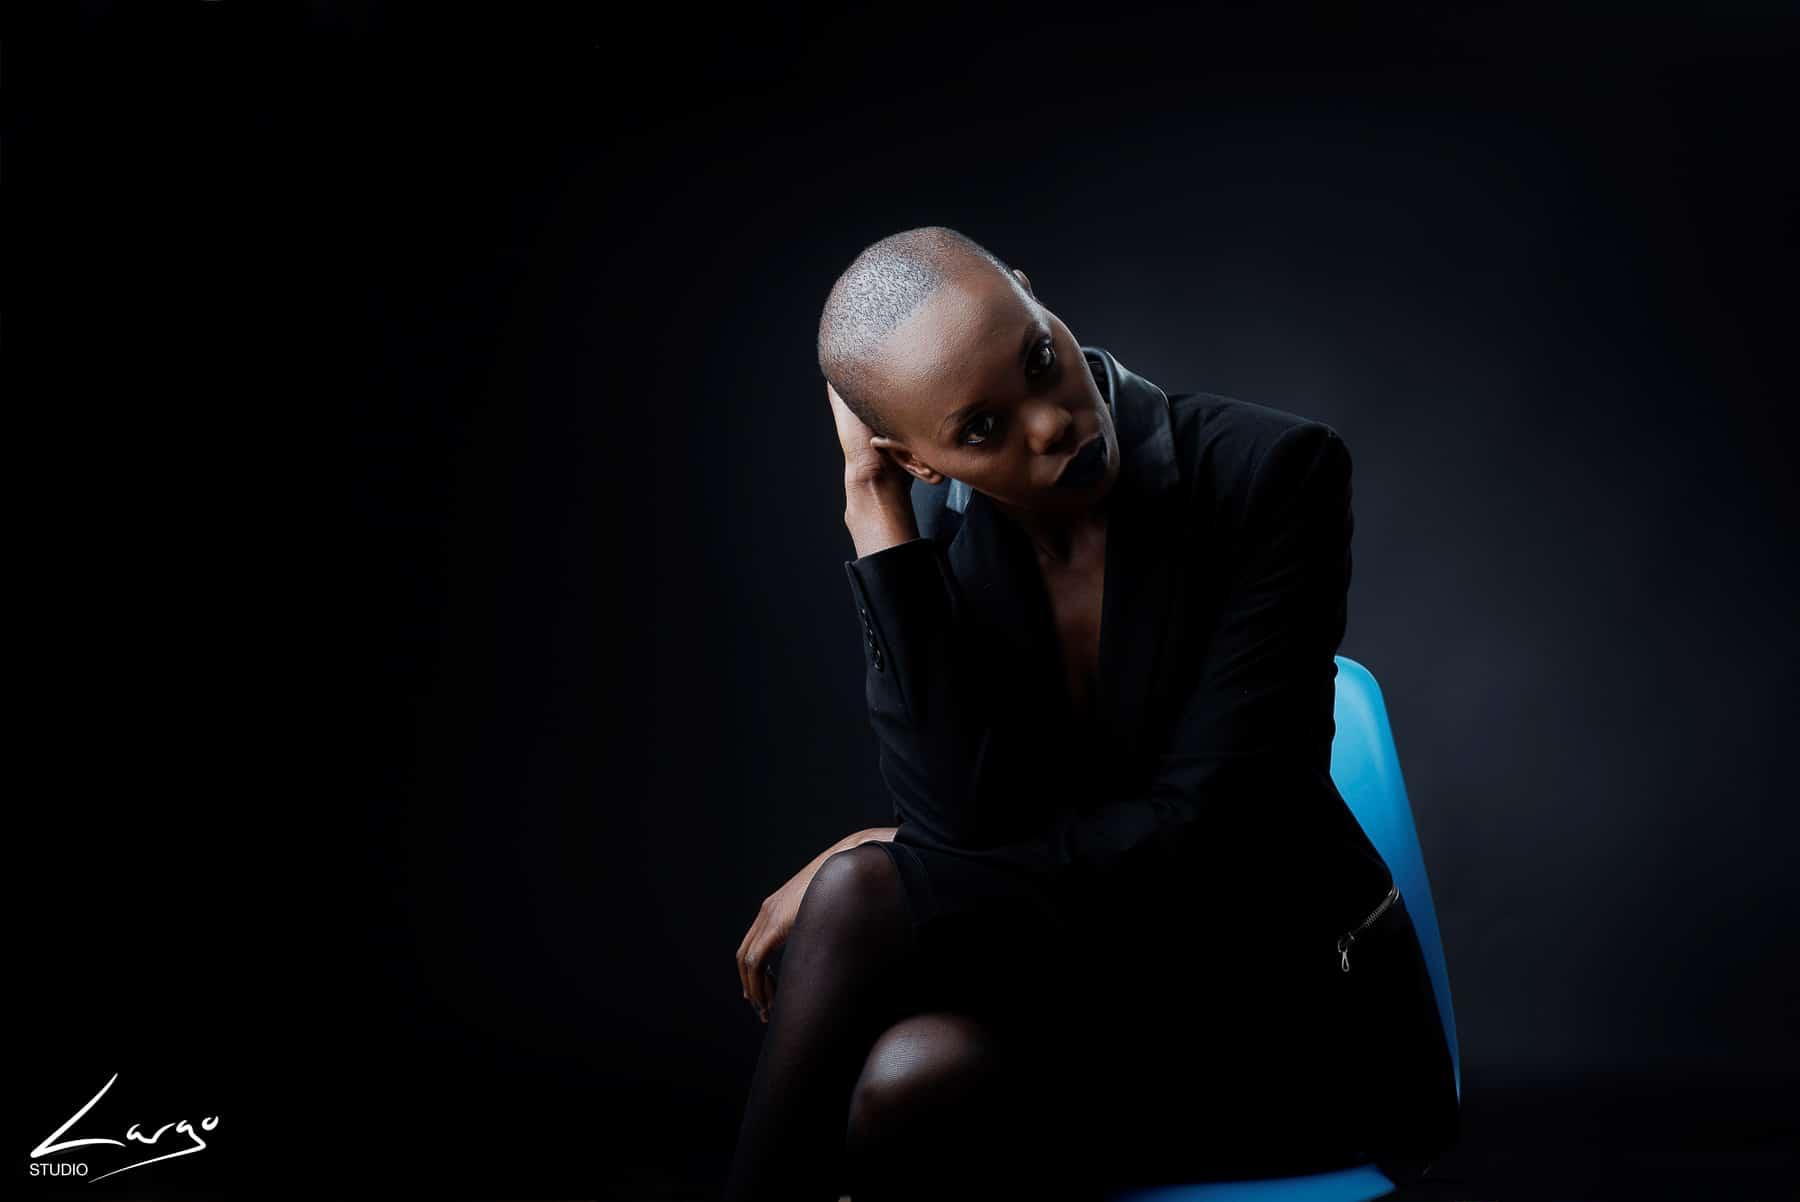 Photographe LYON portraitiste